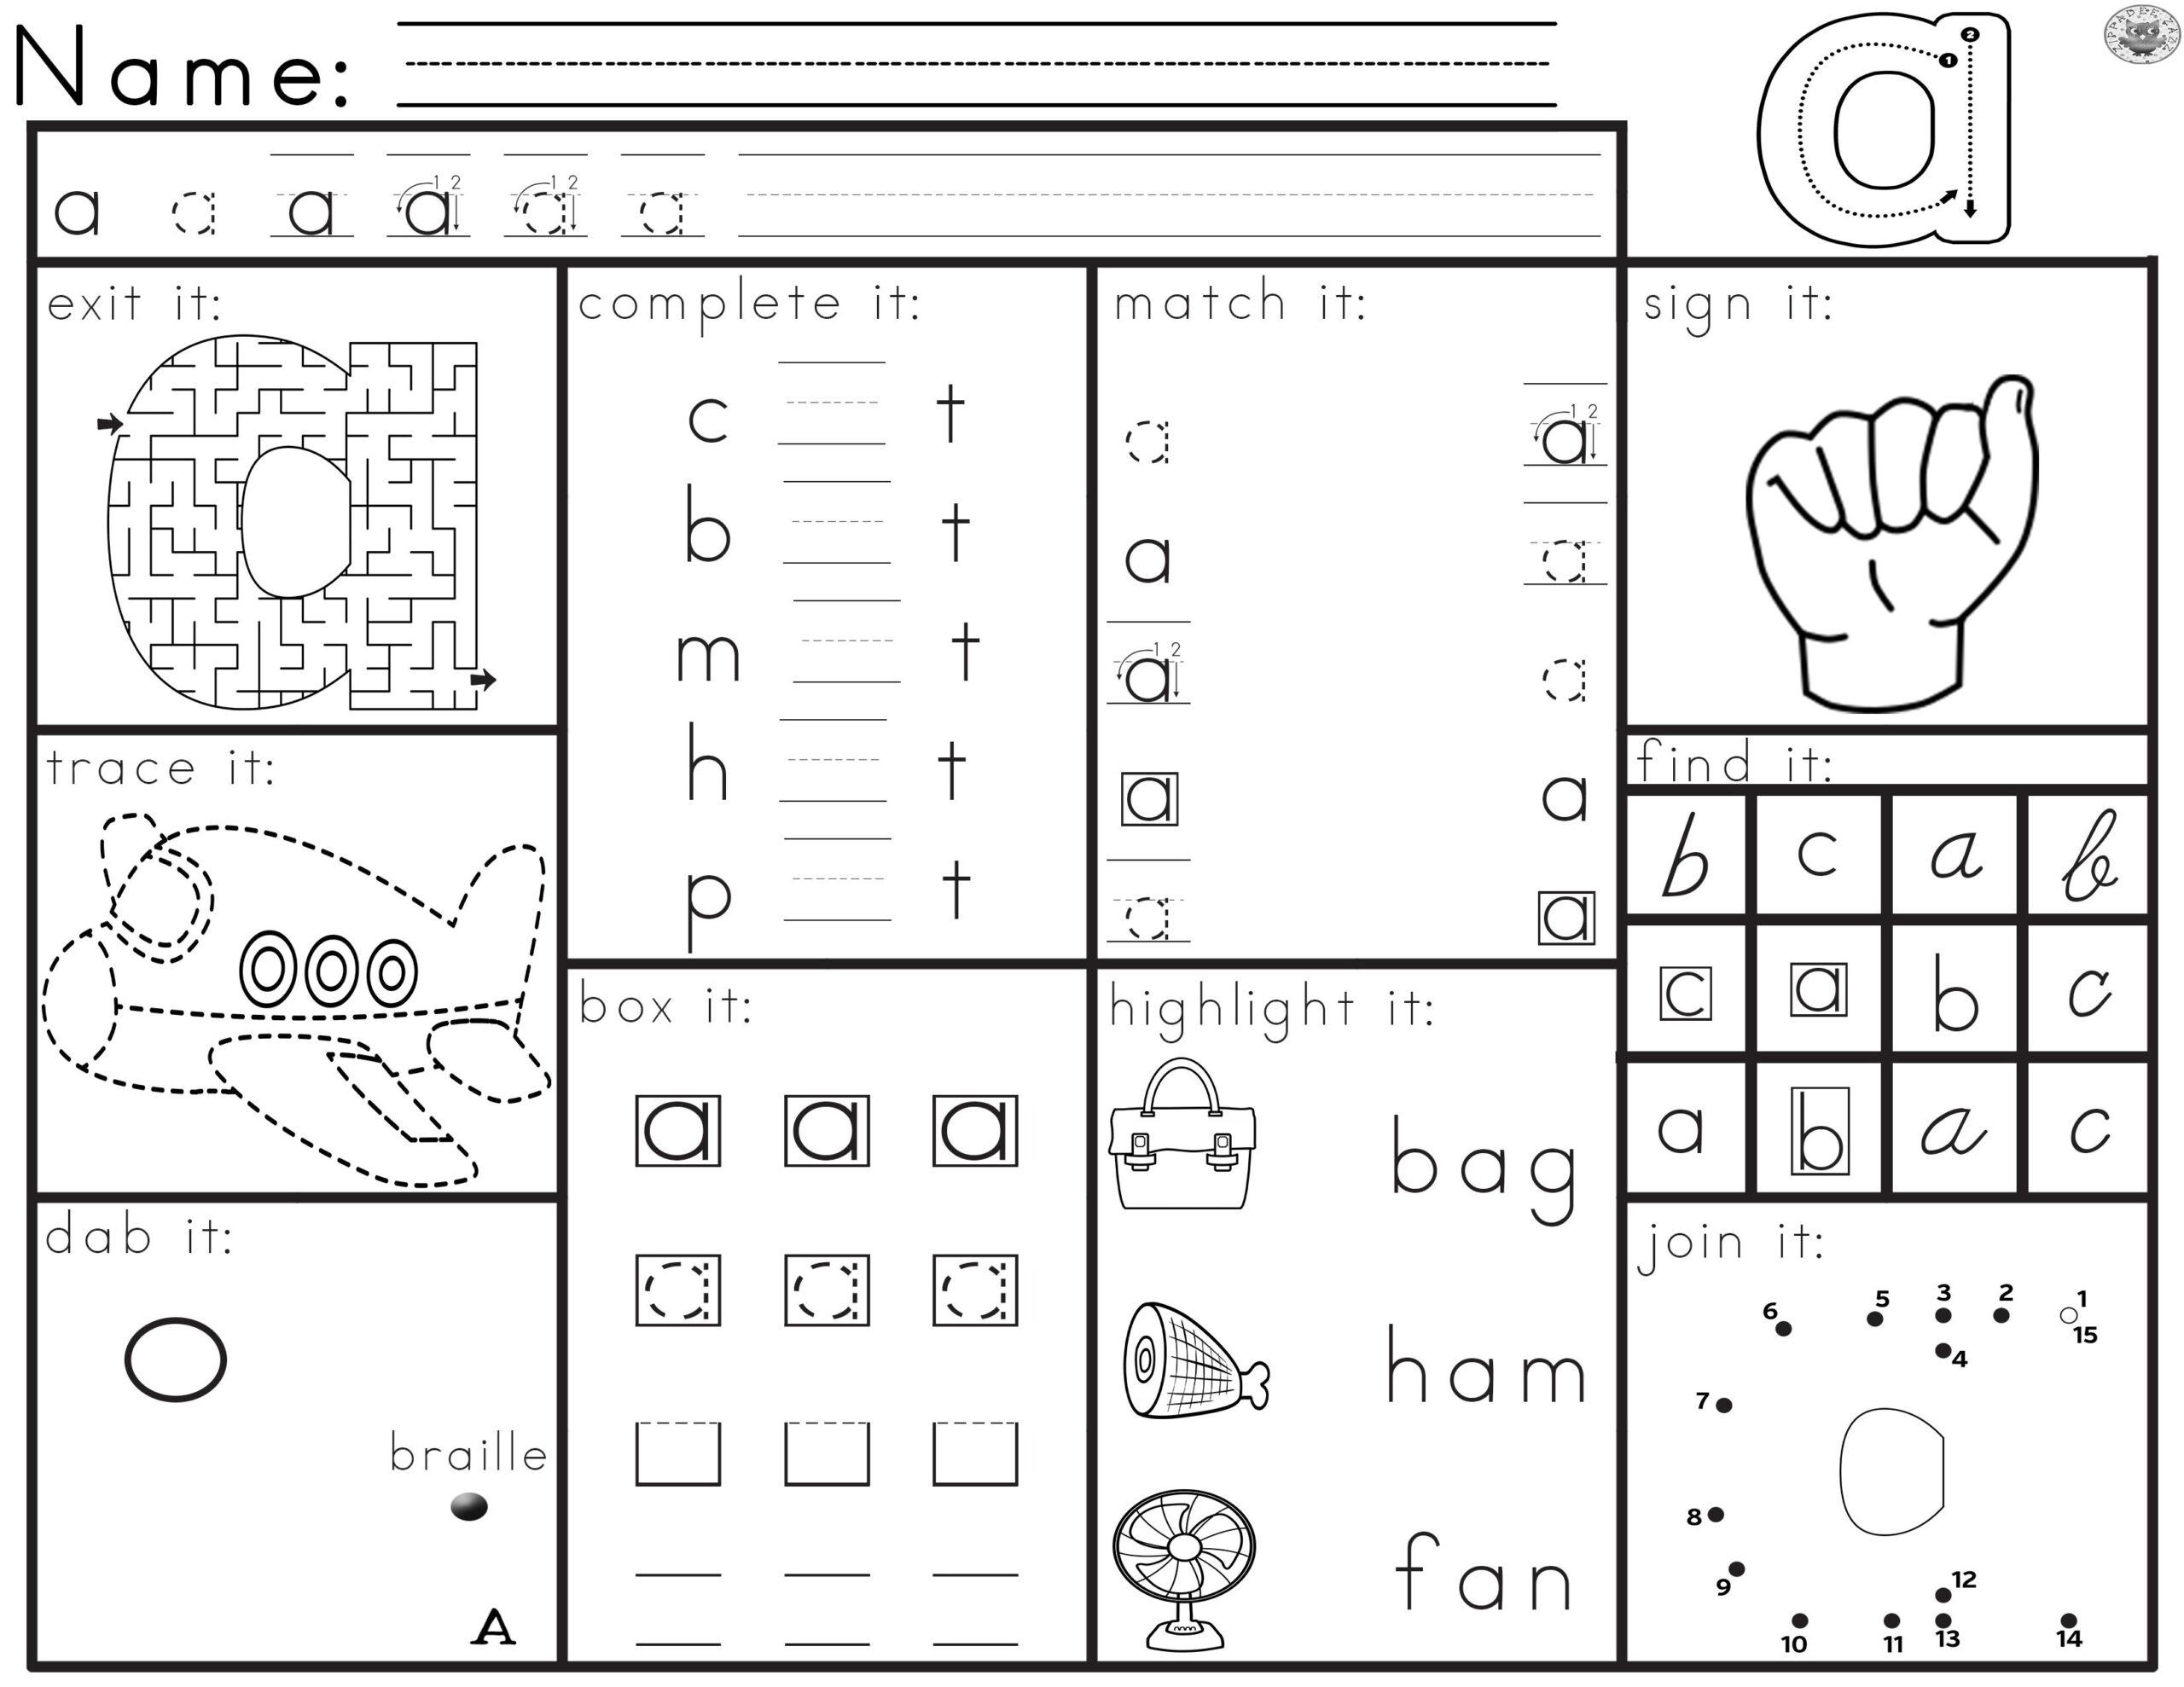 Letter Recognition Activity Worksheets Each Worksheet intended for Alphabet Recognition Worksheets For Preschool